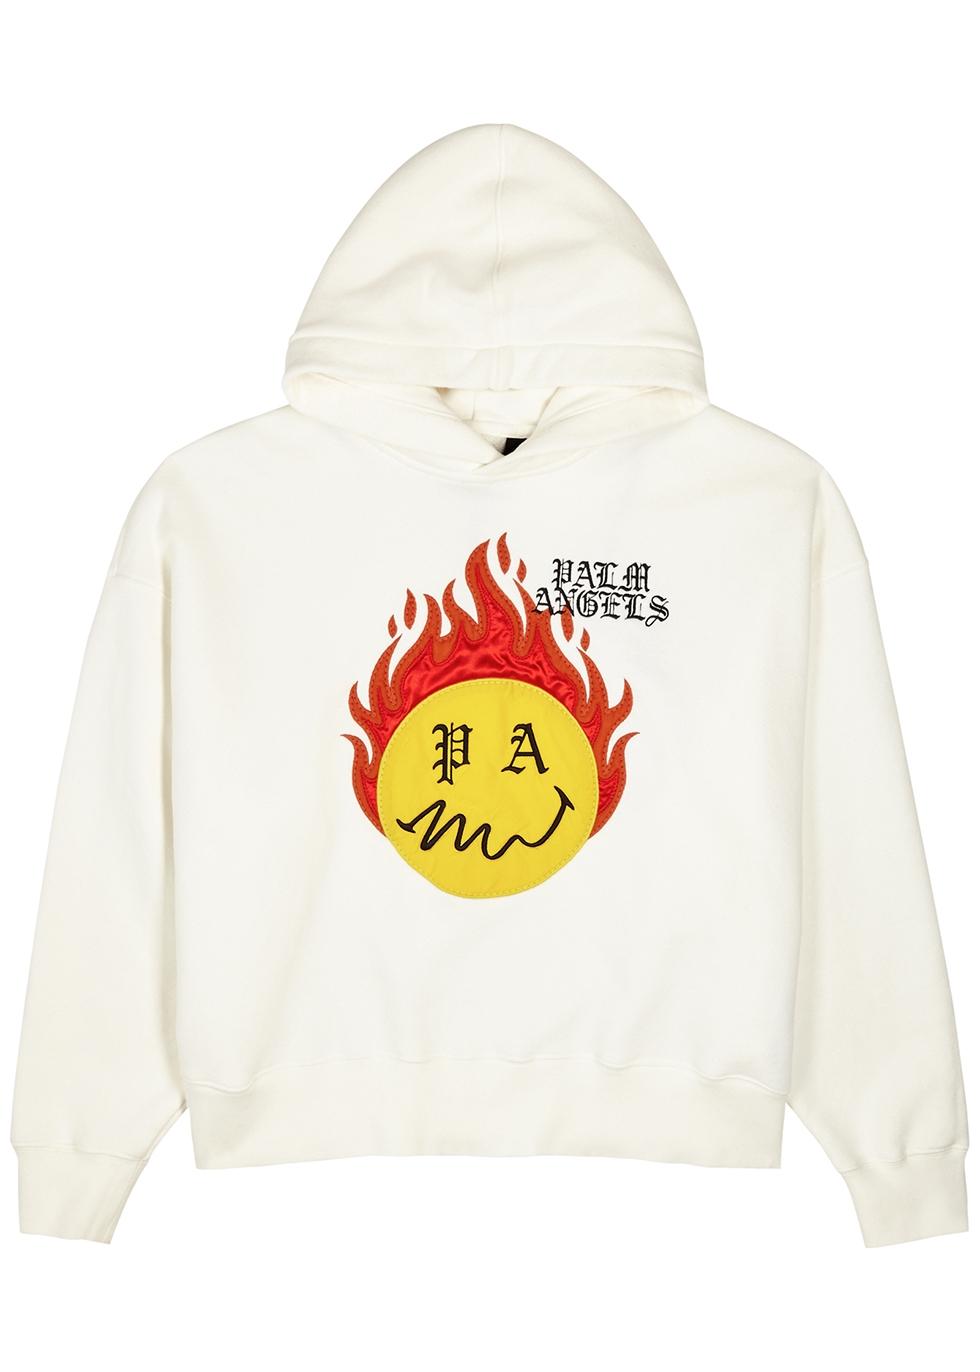 X Smiley Burning Head hooded cotton sweatshirt